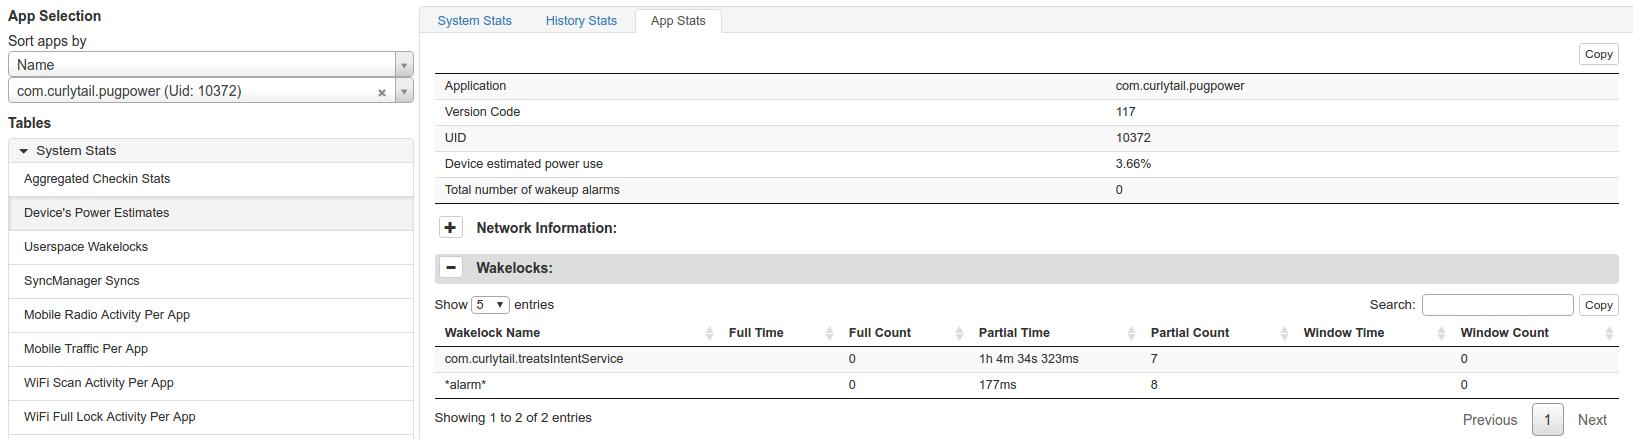 Data tabel untuk aplikasi fiksi Pug Power.